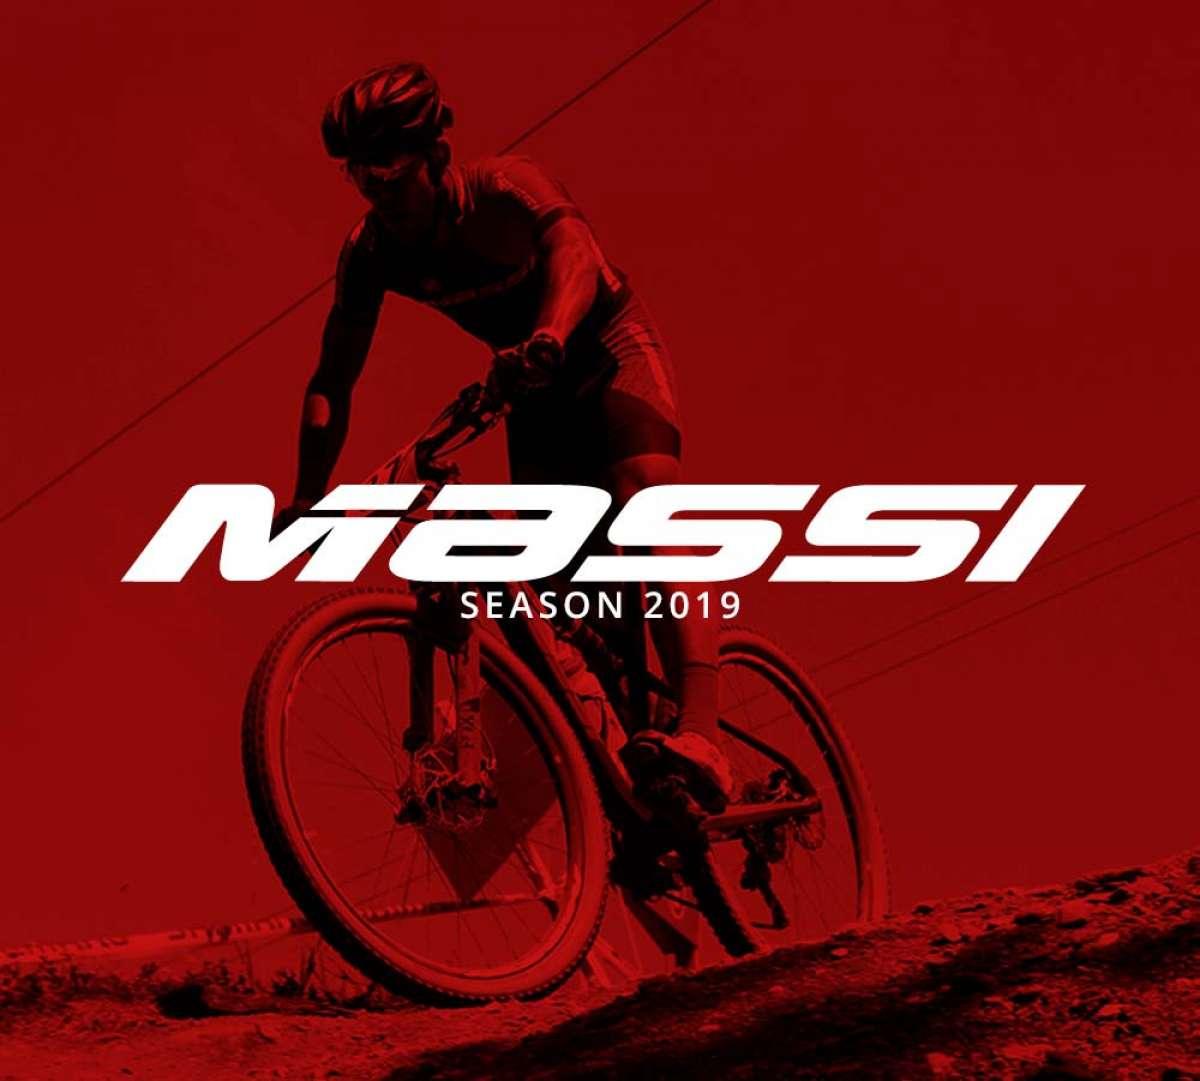 Catálogo de Massi Bikes 2019. Toda la gama de bicicletas Massi para la temporada 2019